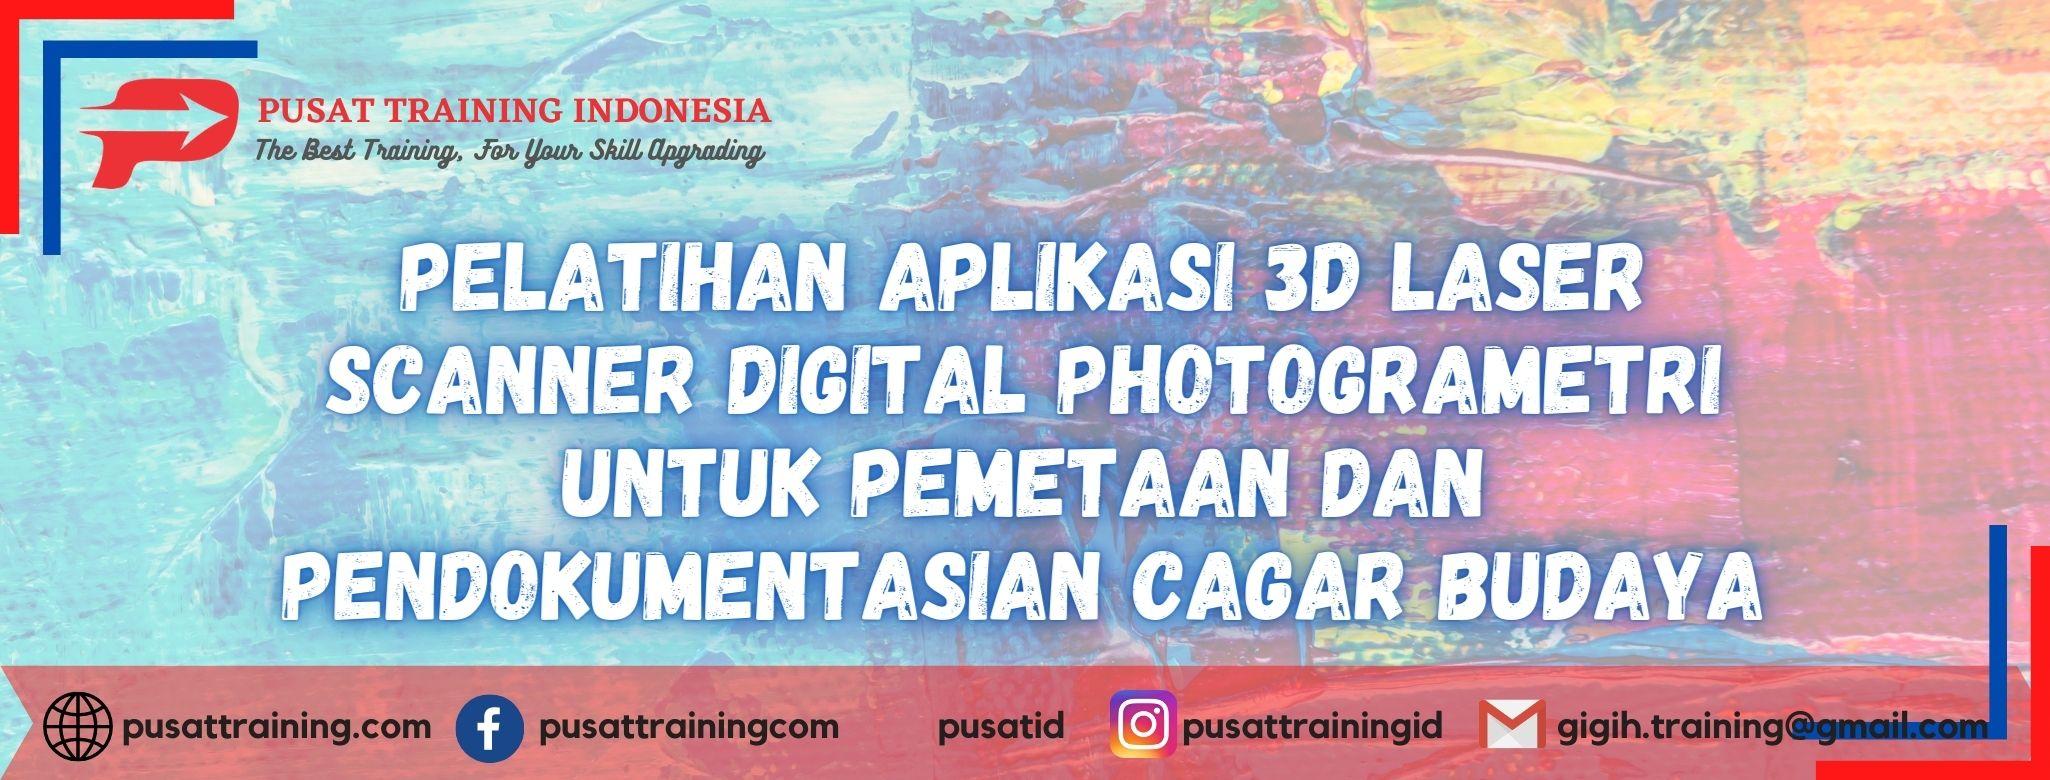 Pelatihan-Aplikasi-3D-Laser-Scanner-Digital-Photogrametri-untuk-Pemetaan-dan-Pendokumentasian-Cagar-Budaya